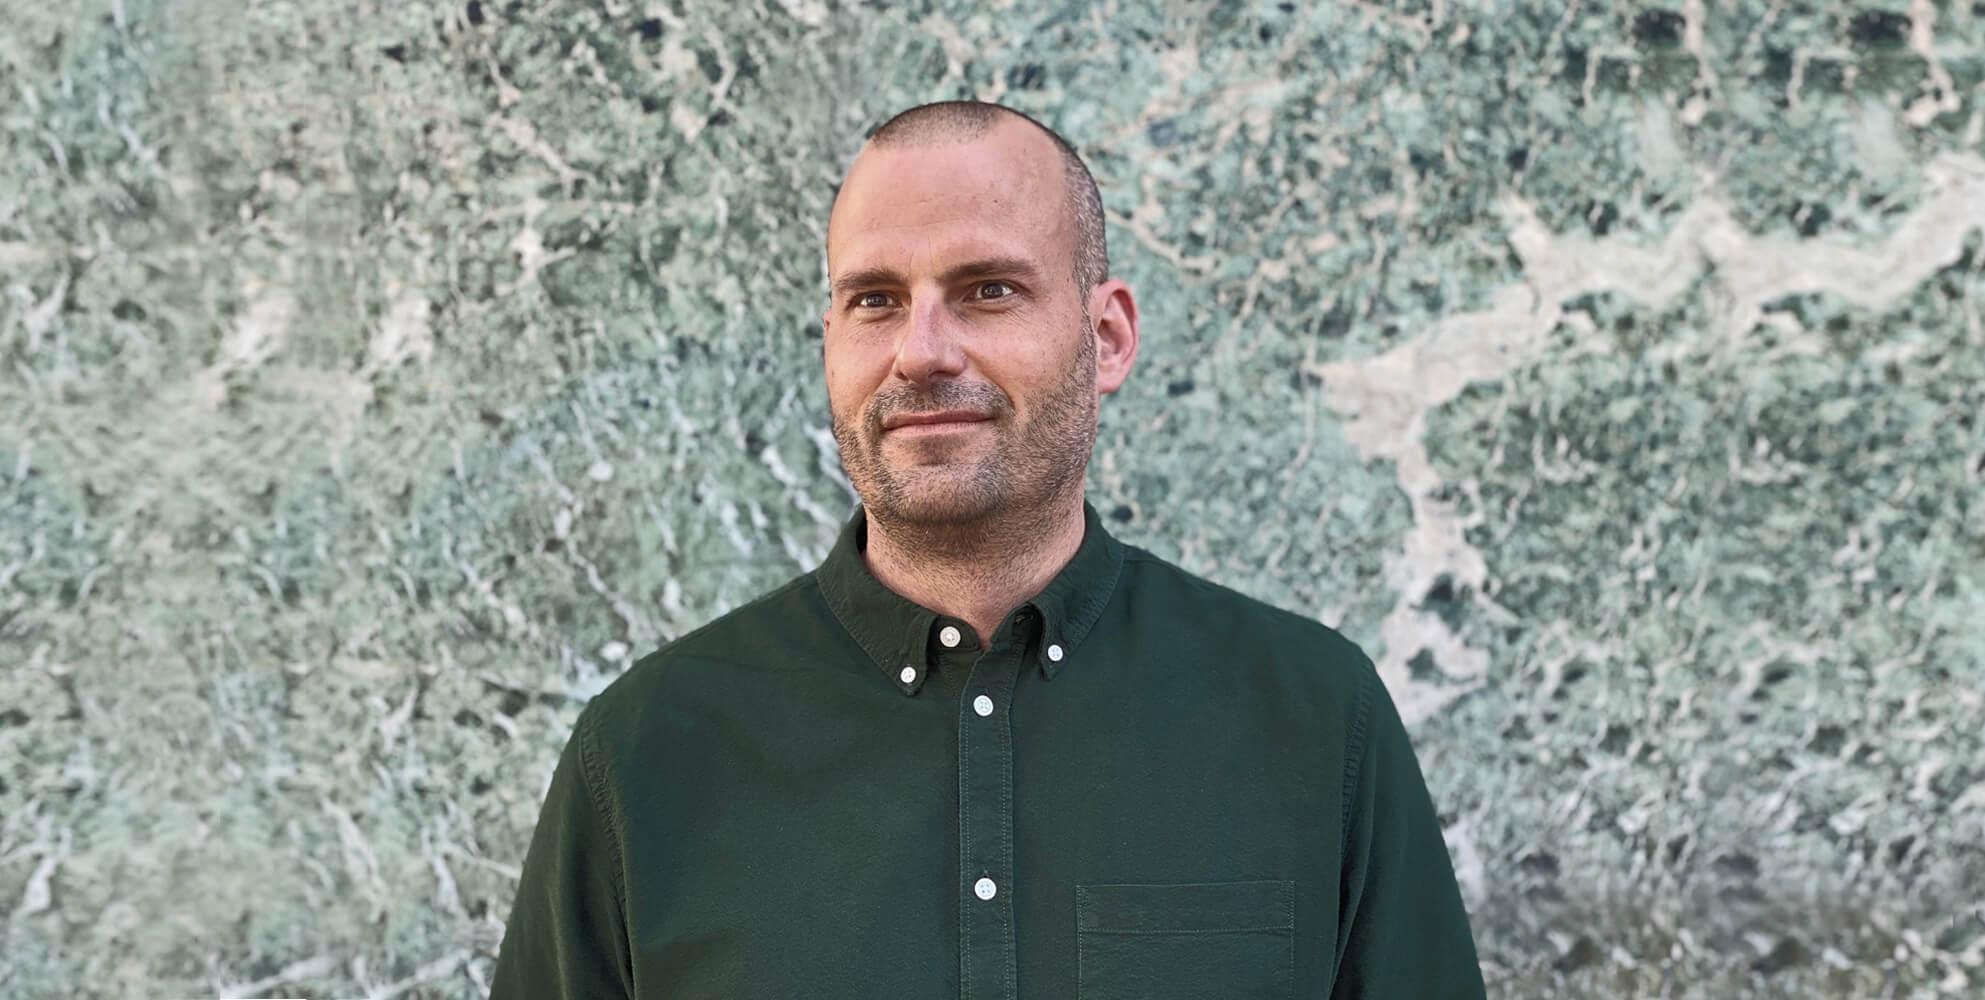 Neuformation bei The House: Frank Lang als Director Consulting in der Geschäftsleitung